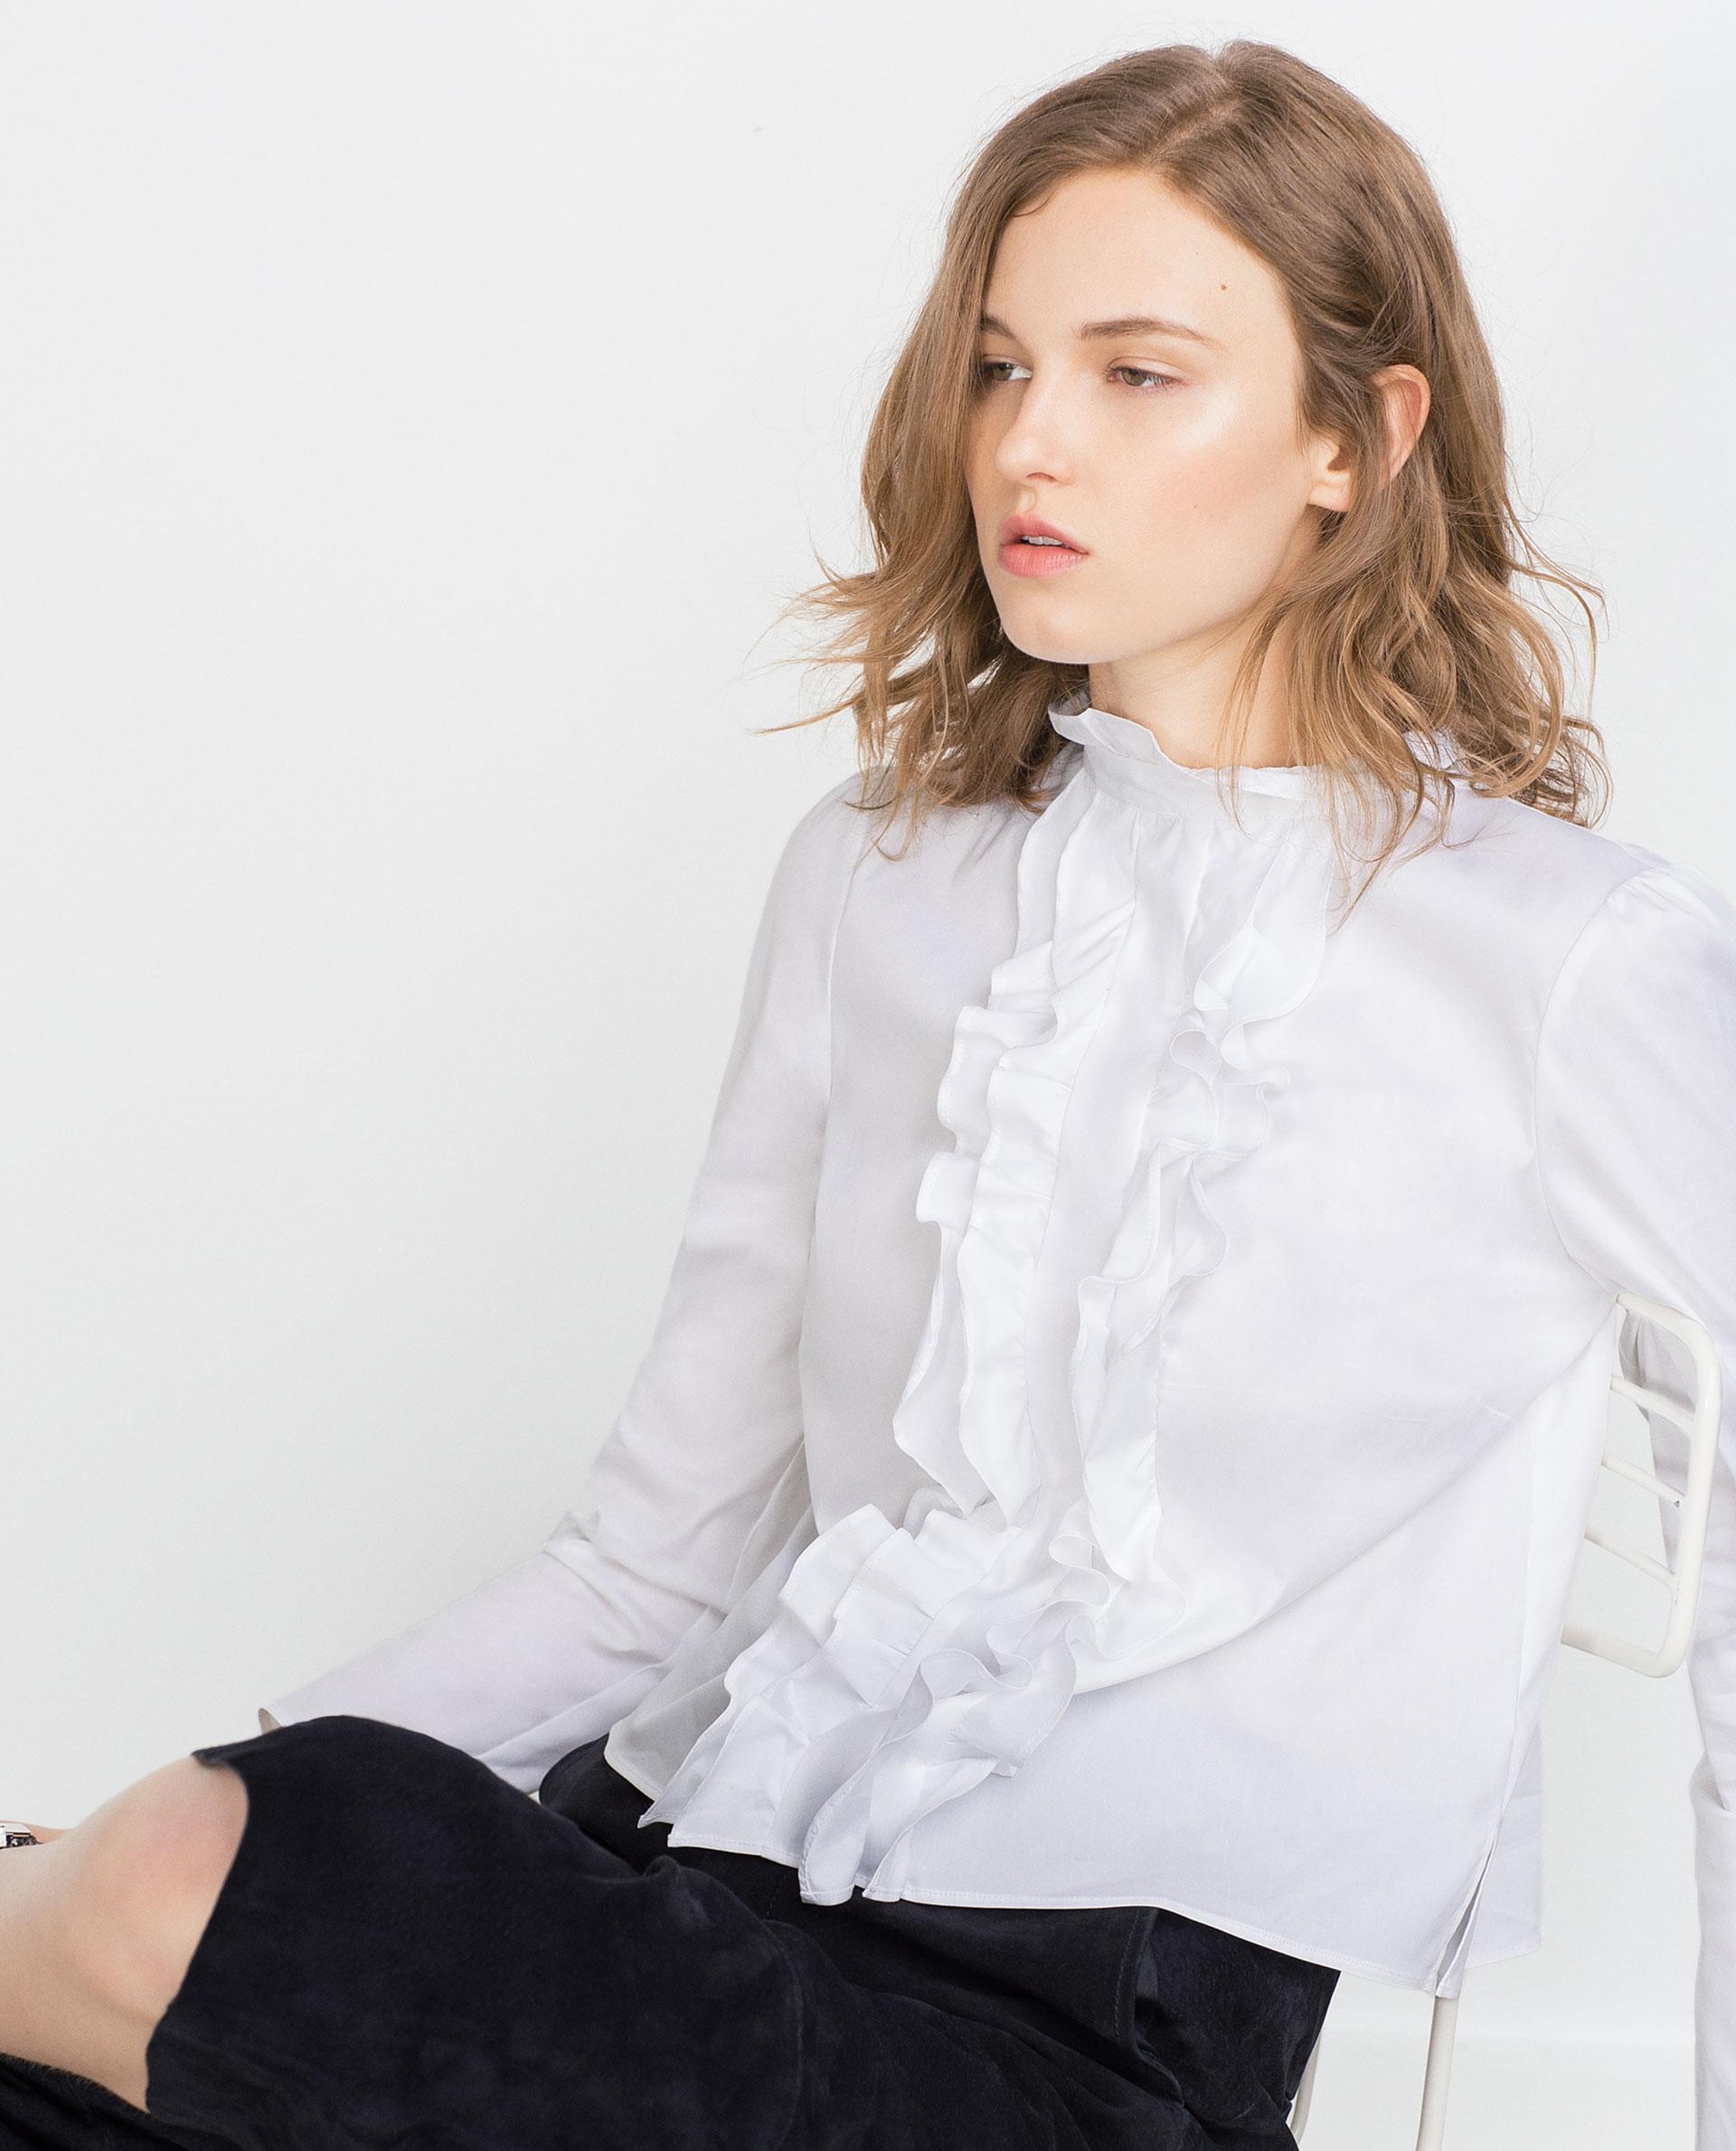 ROSE & IVY Journal Zara Fall 2015